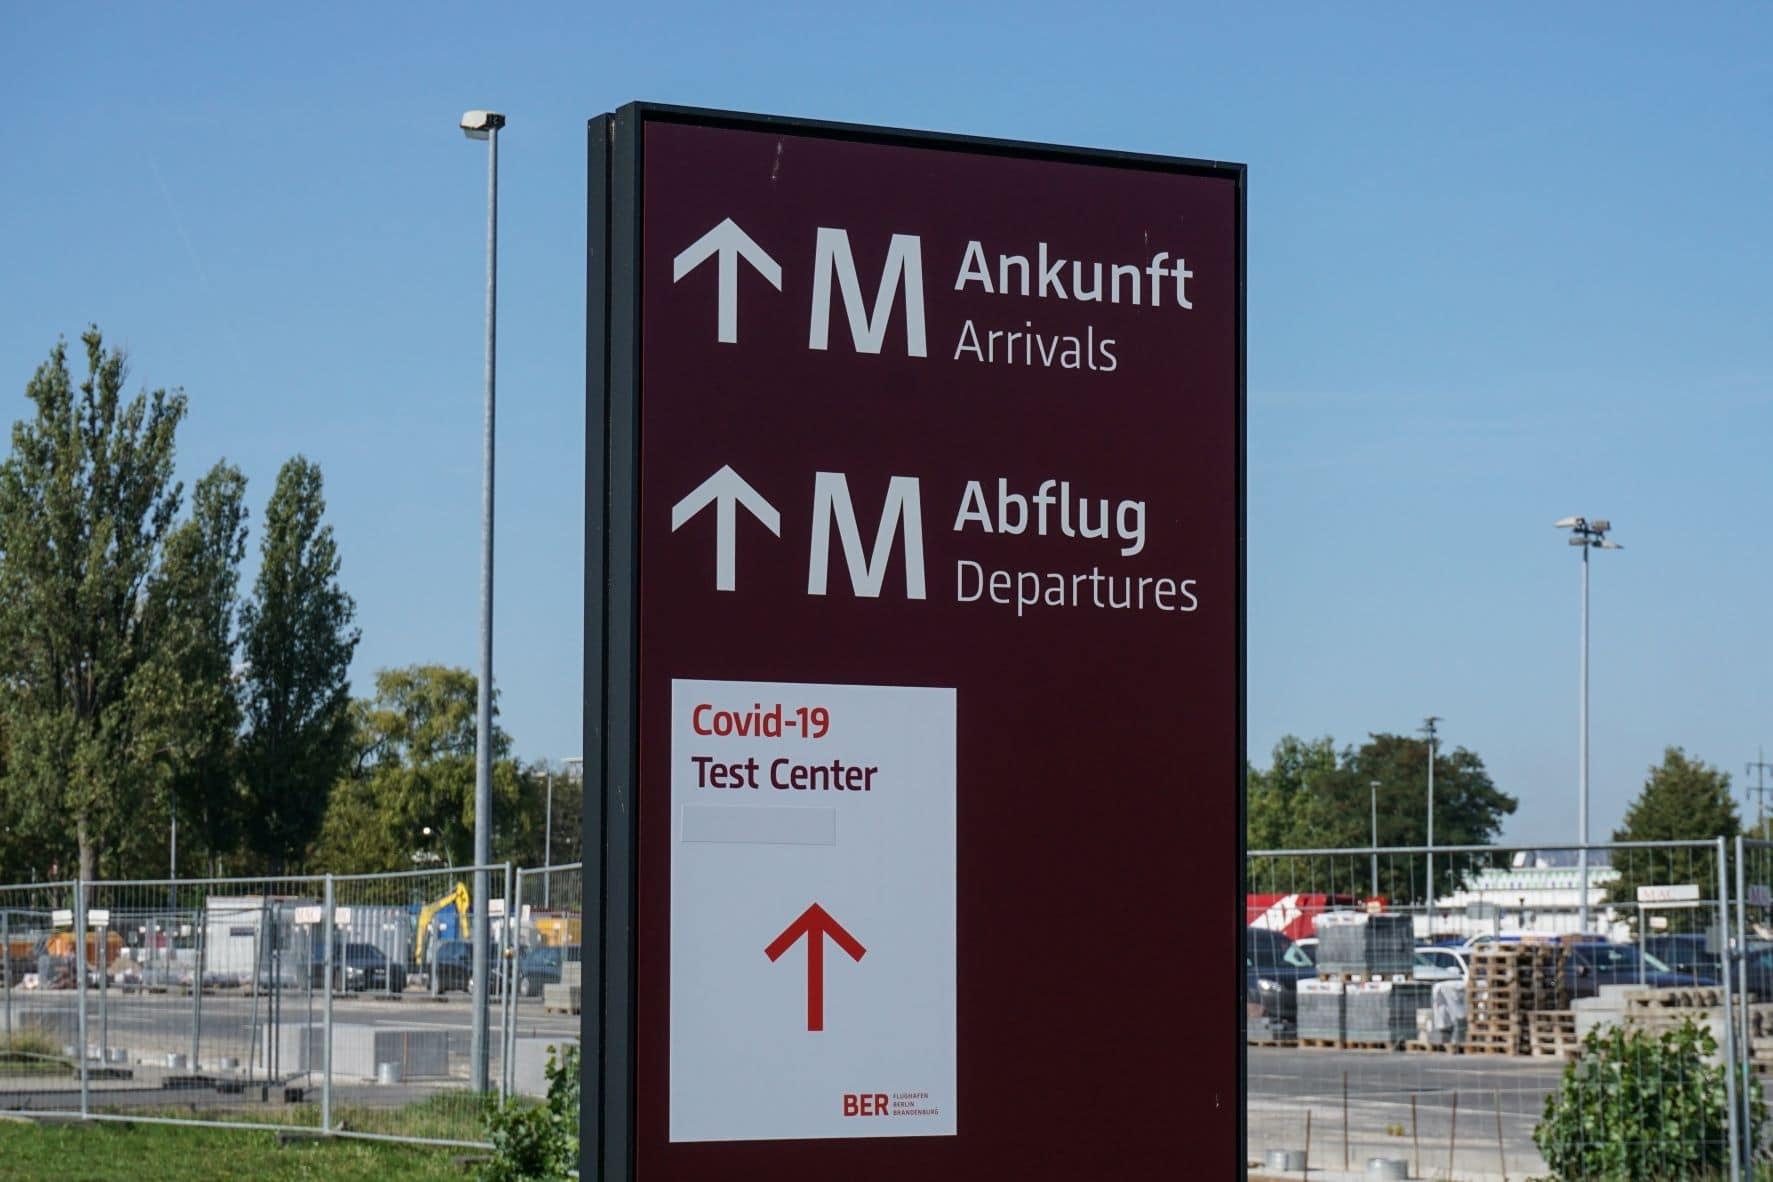 Hinweisschild am Flughafen BER in Berlin